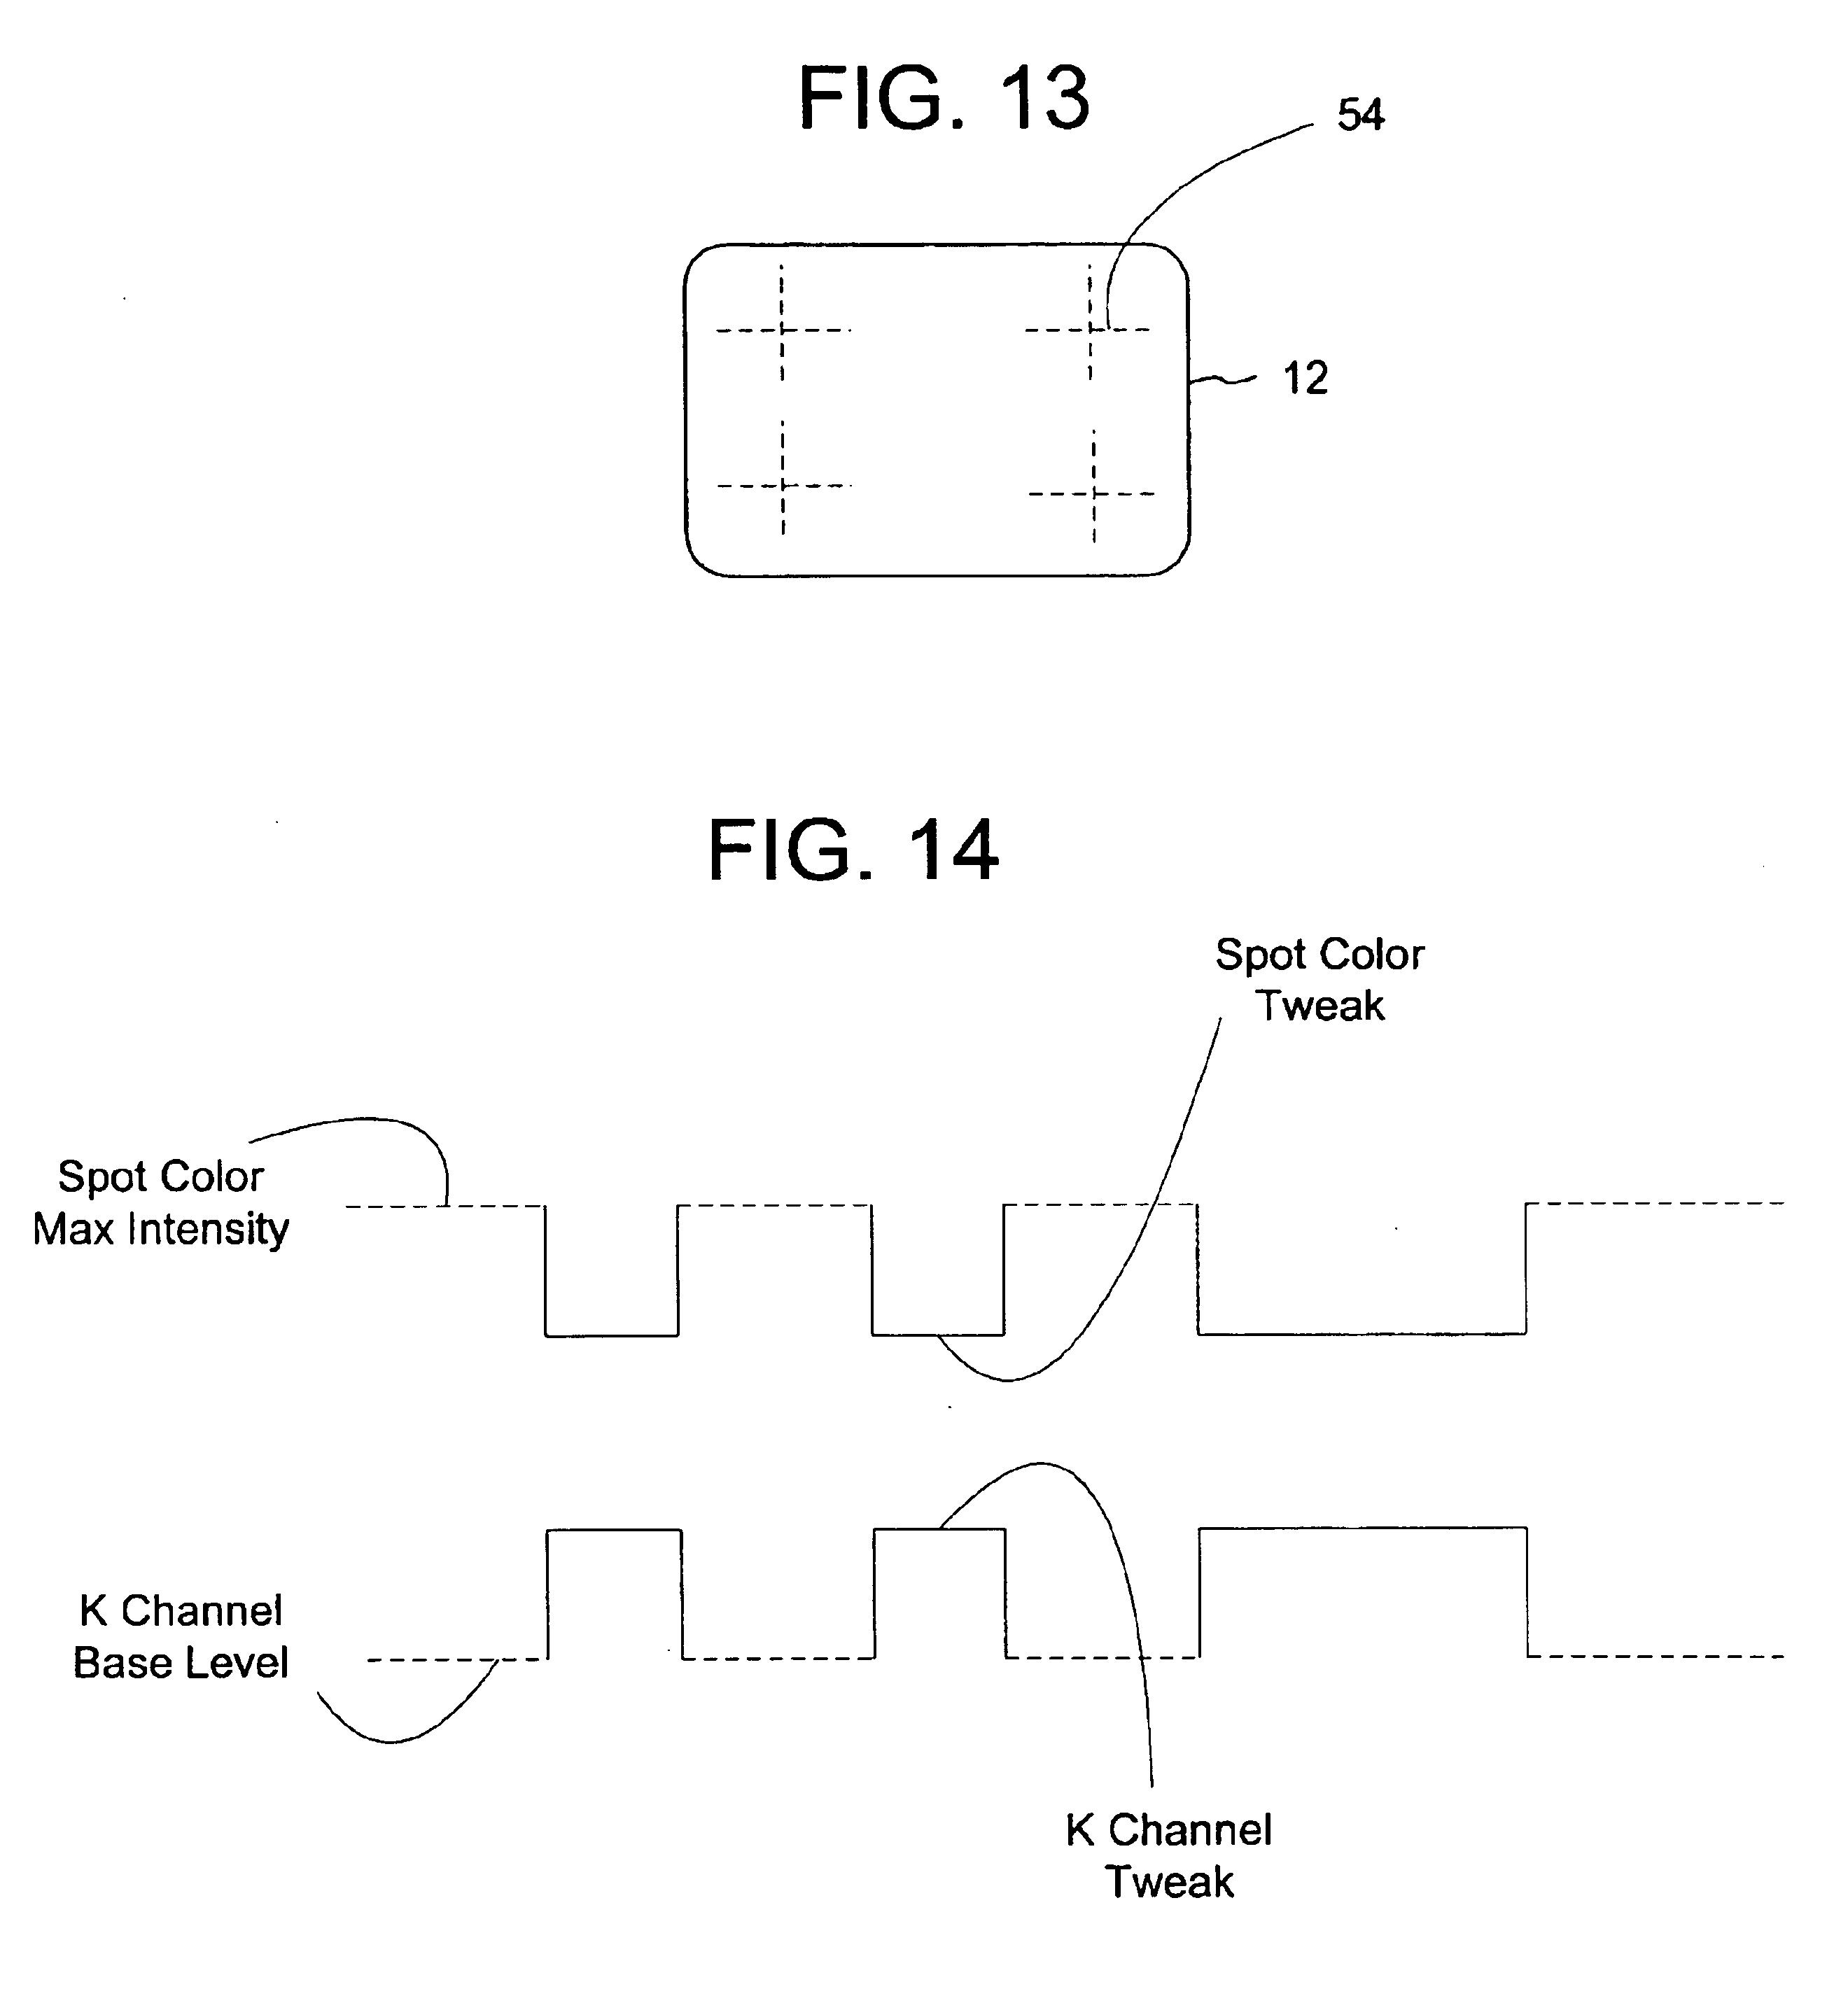 Patent US 6,891,959 B2